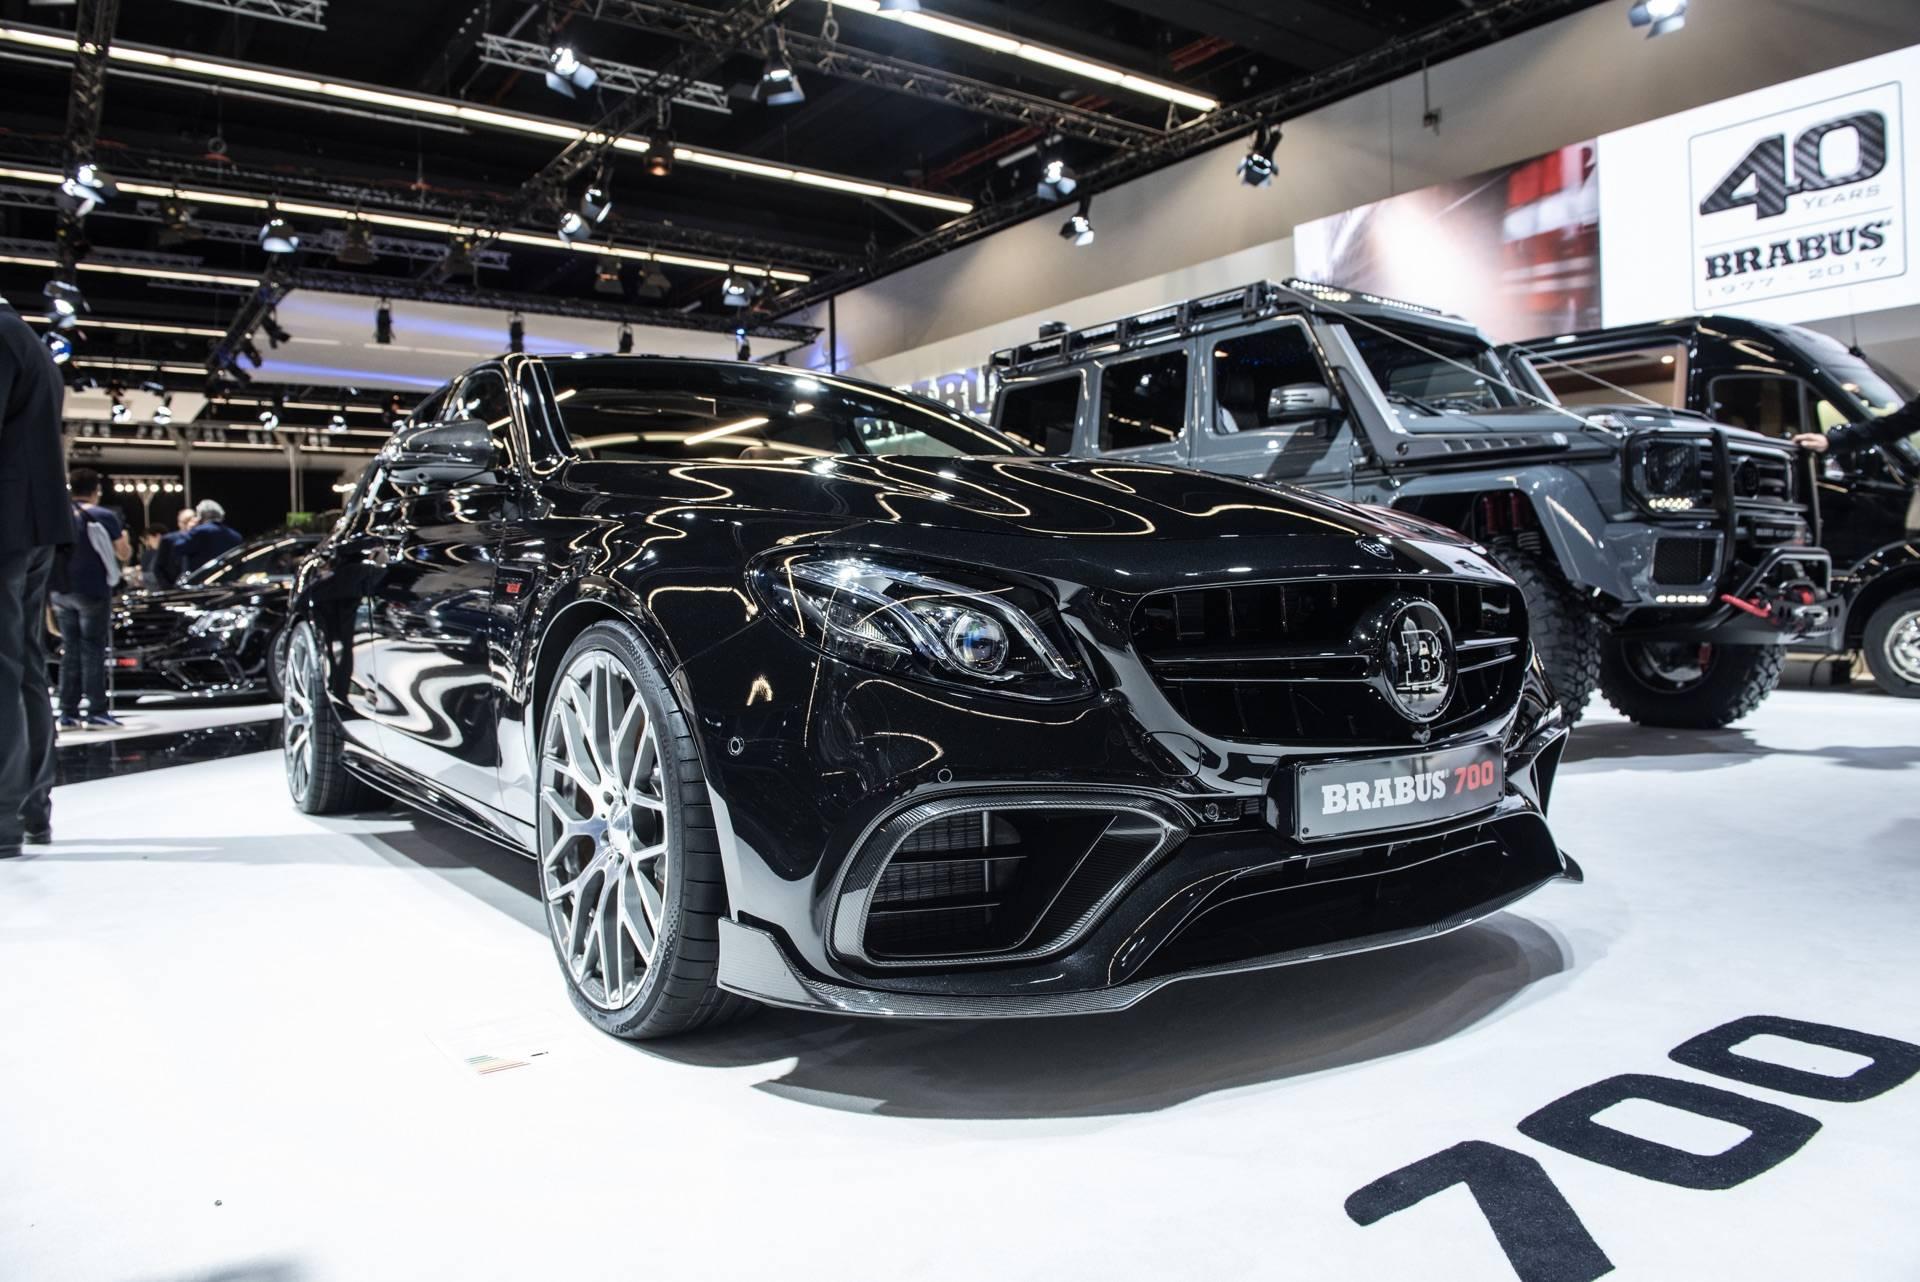 IAA Frankfurt 2017: Brabus 700 Mercedes-AMG E63 - GTspirit